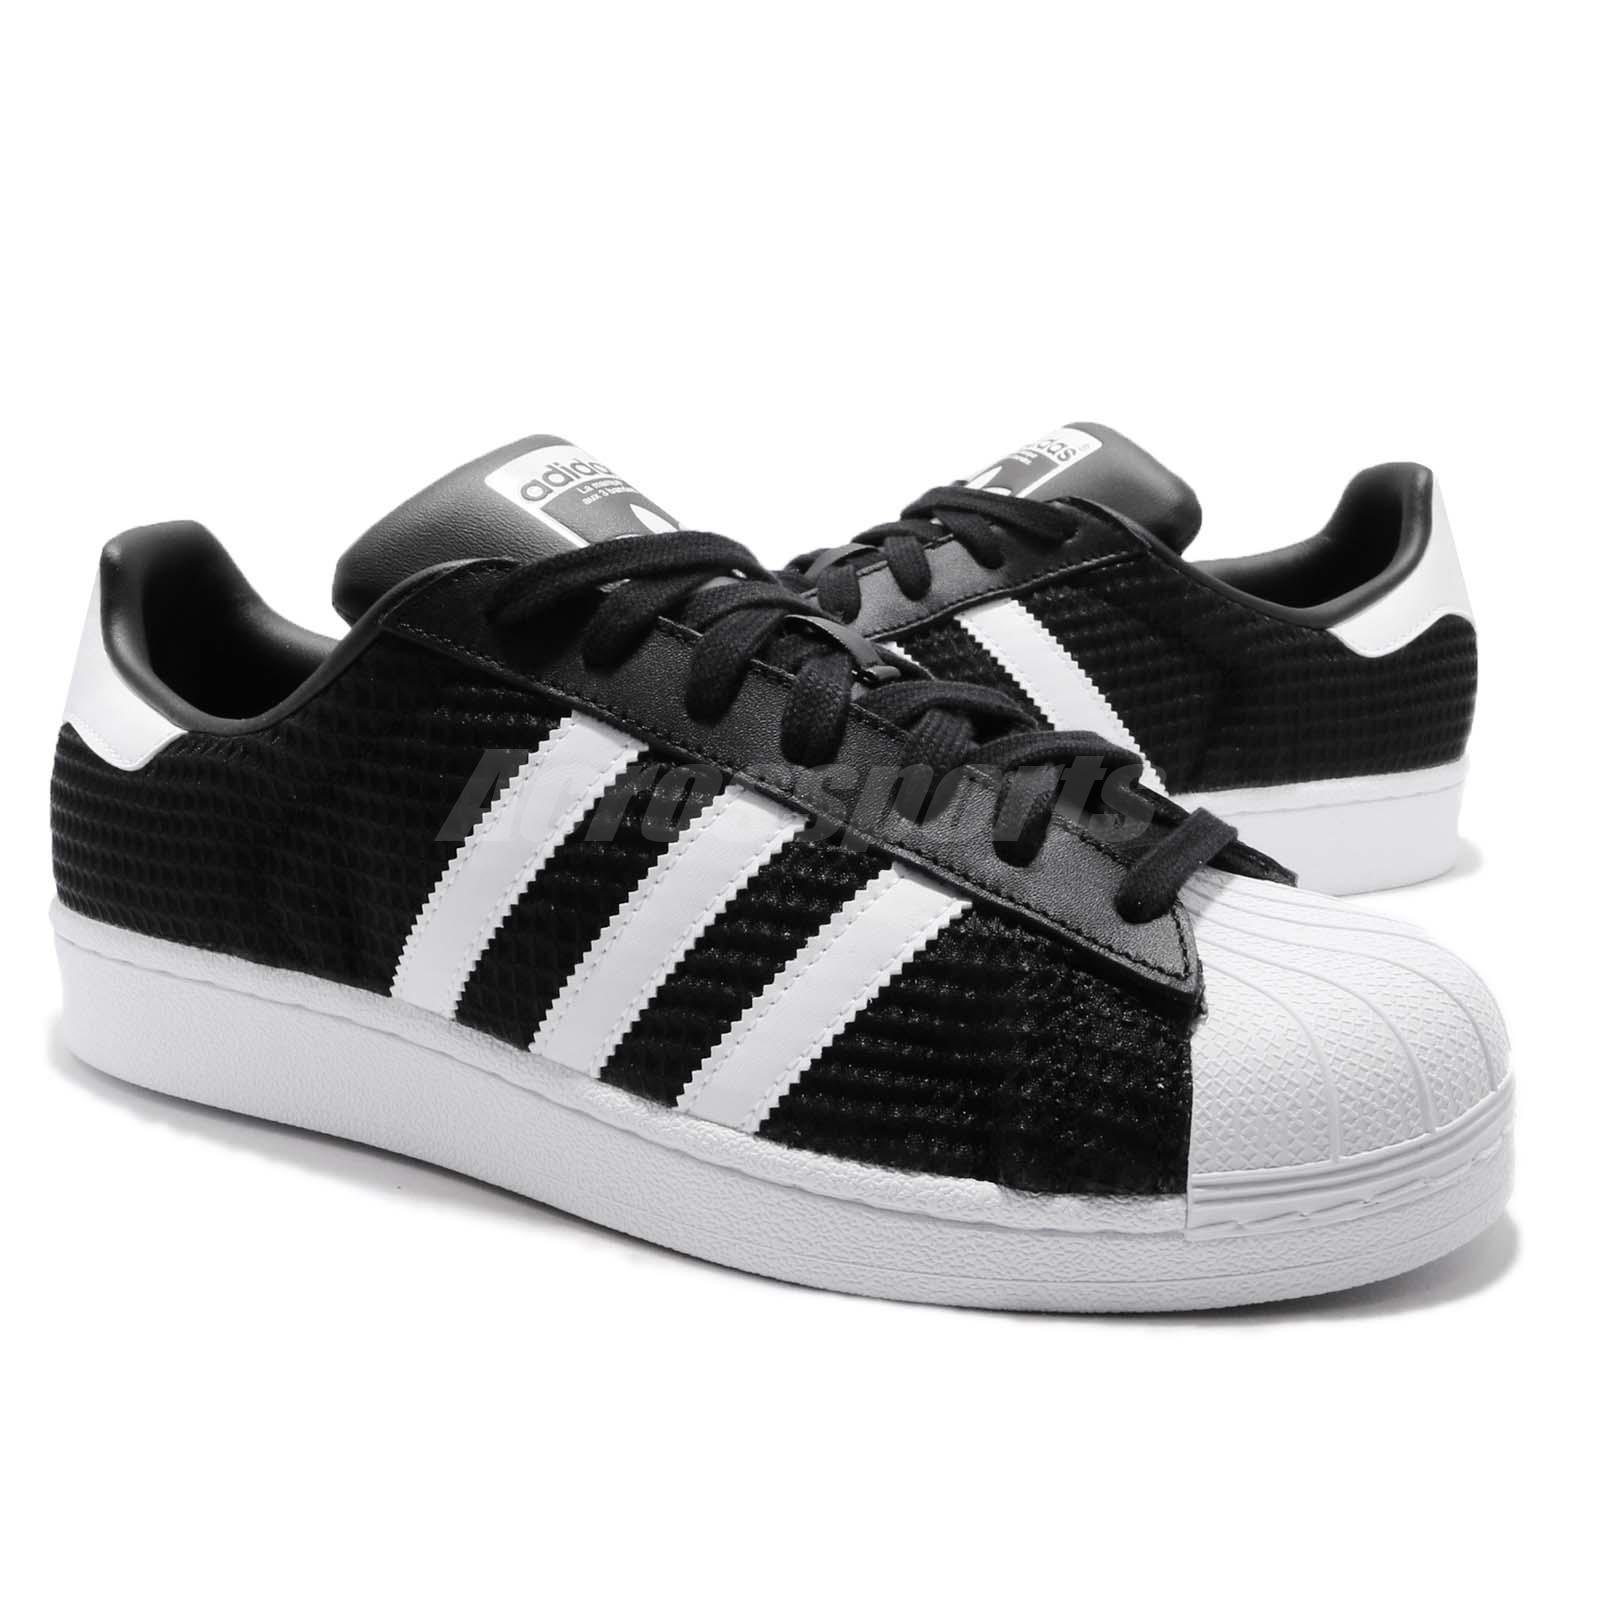 Details about adidas Originals Superstar Black White Men Casual Classic Shoes Sneakers CM8078